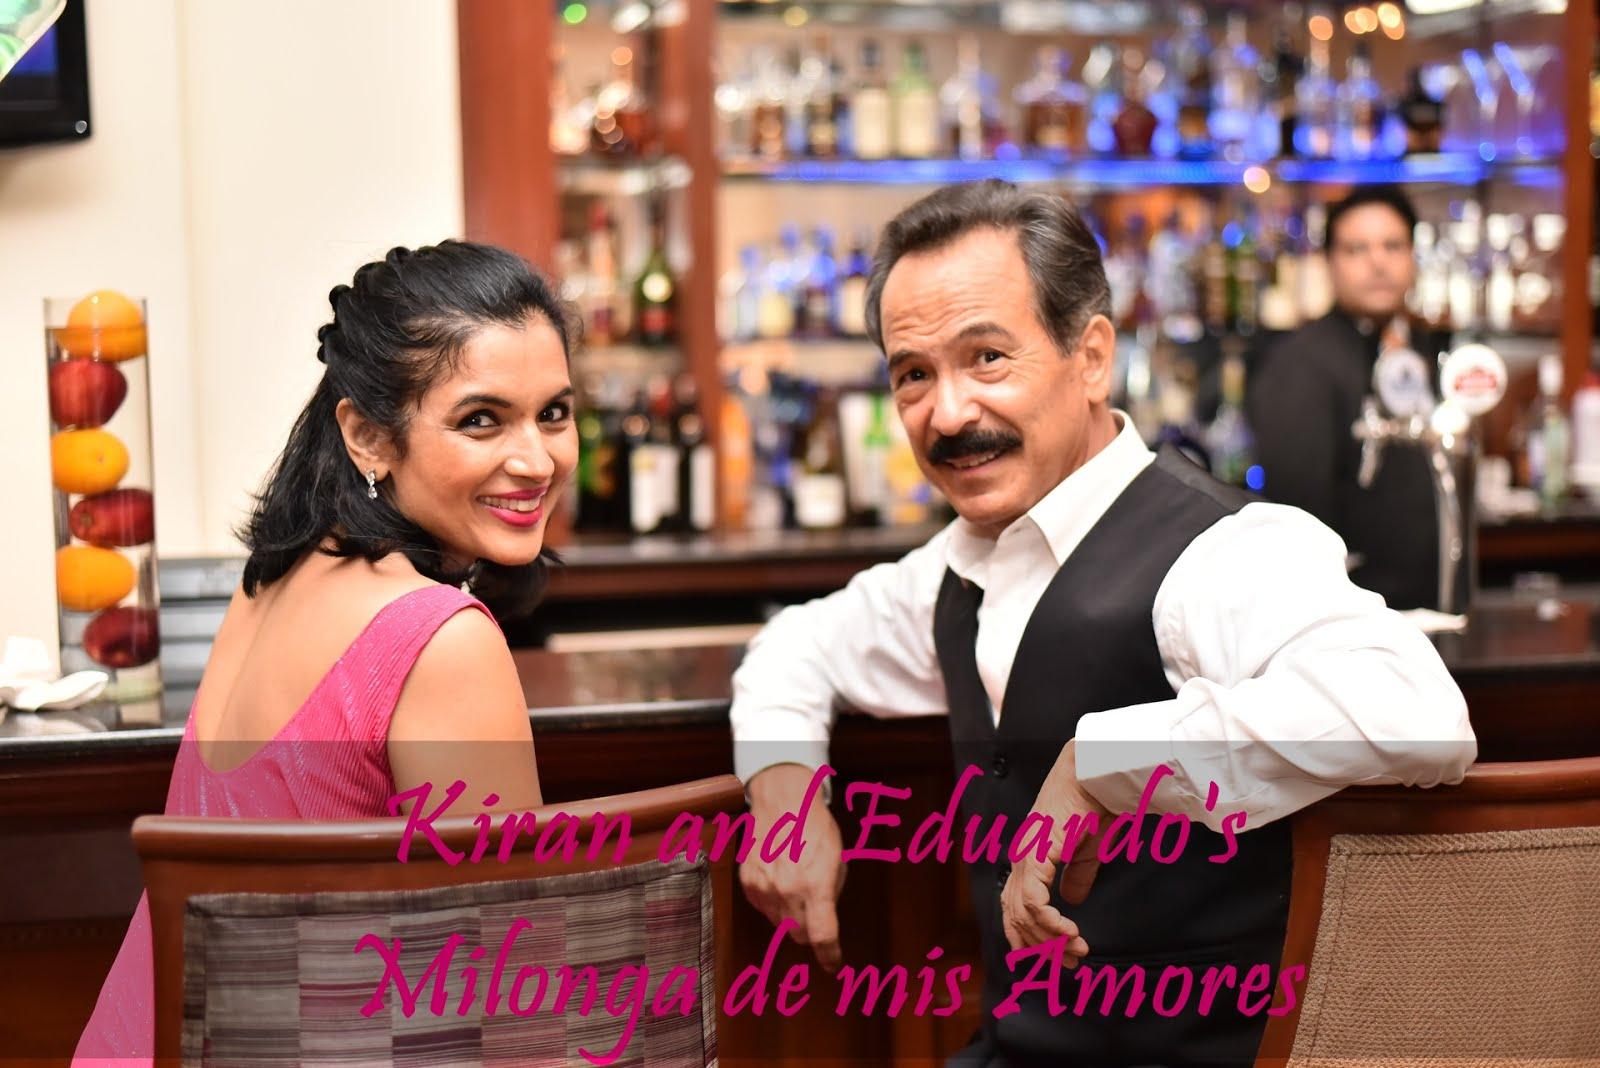 Launch of Eduardo's Milonga de mis Amores